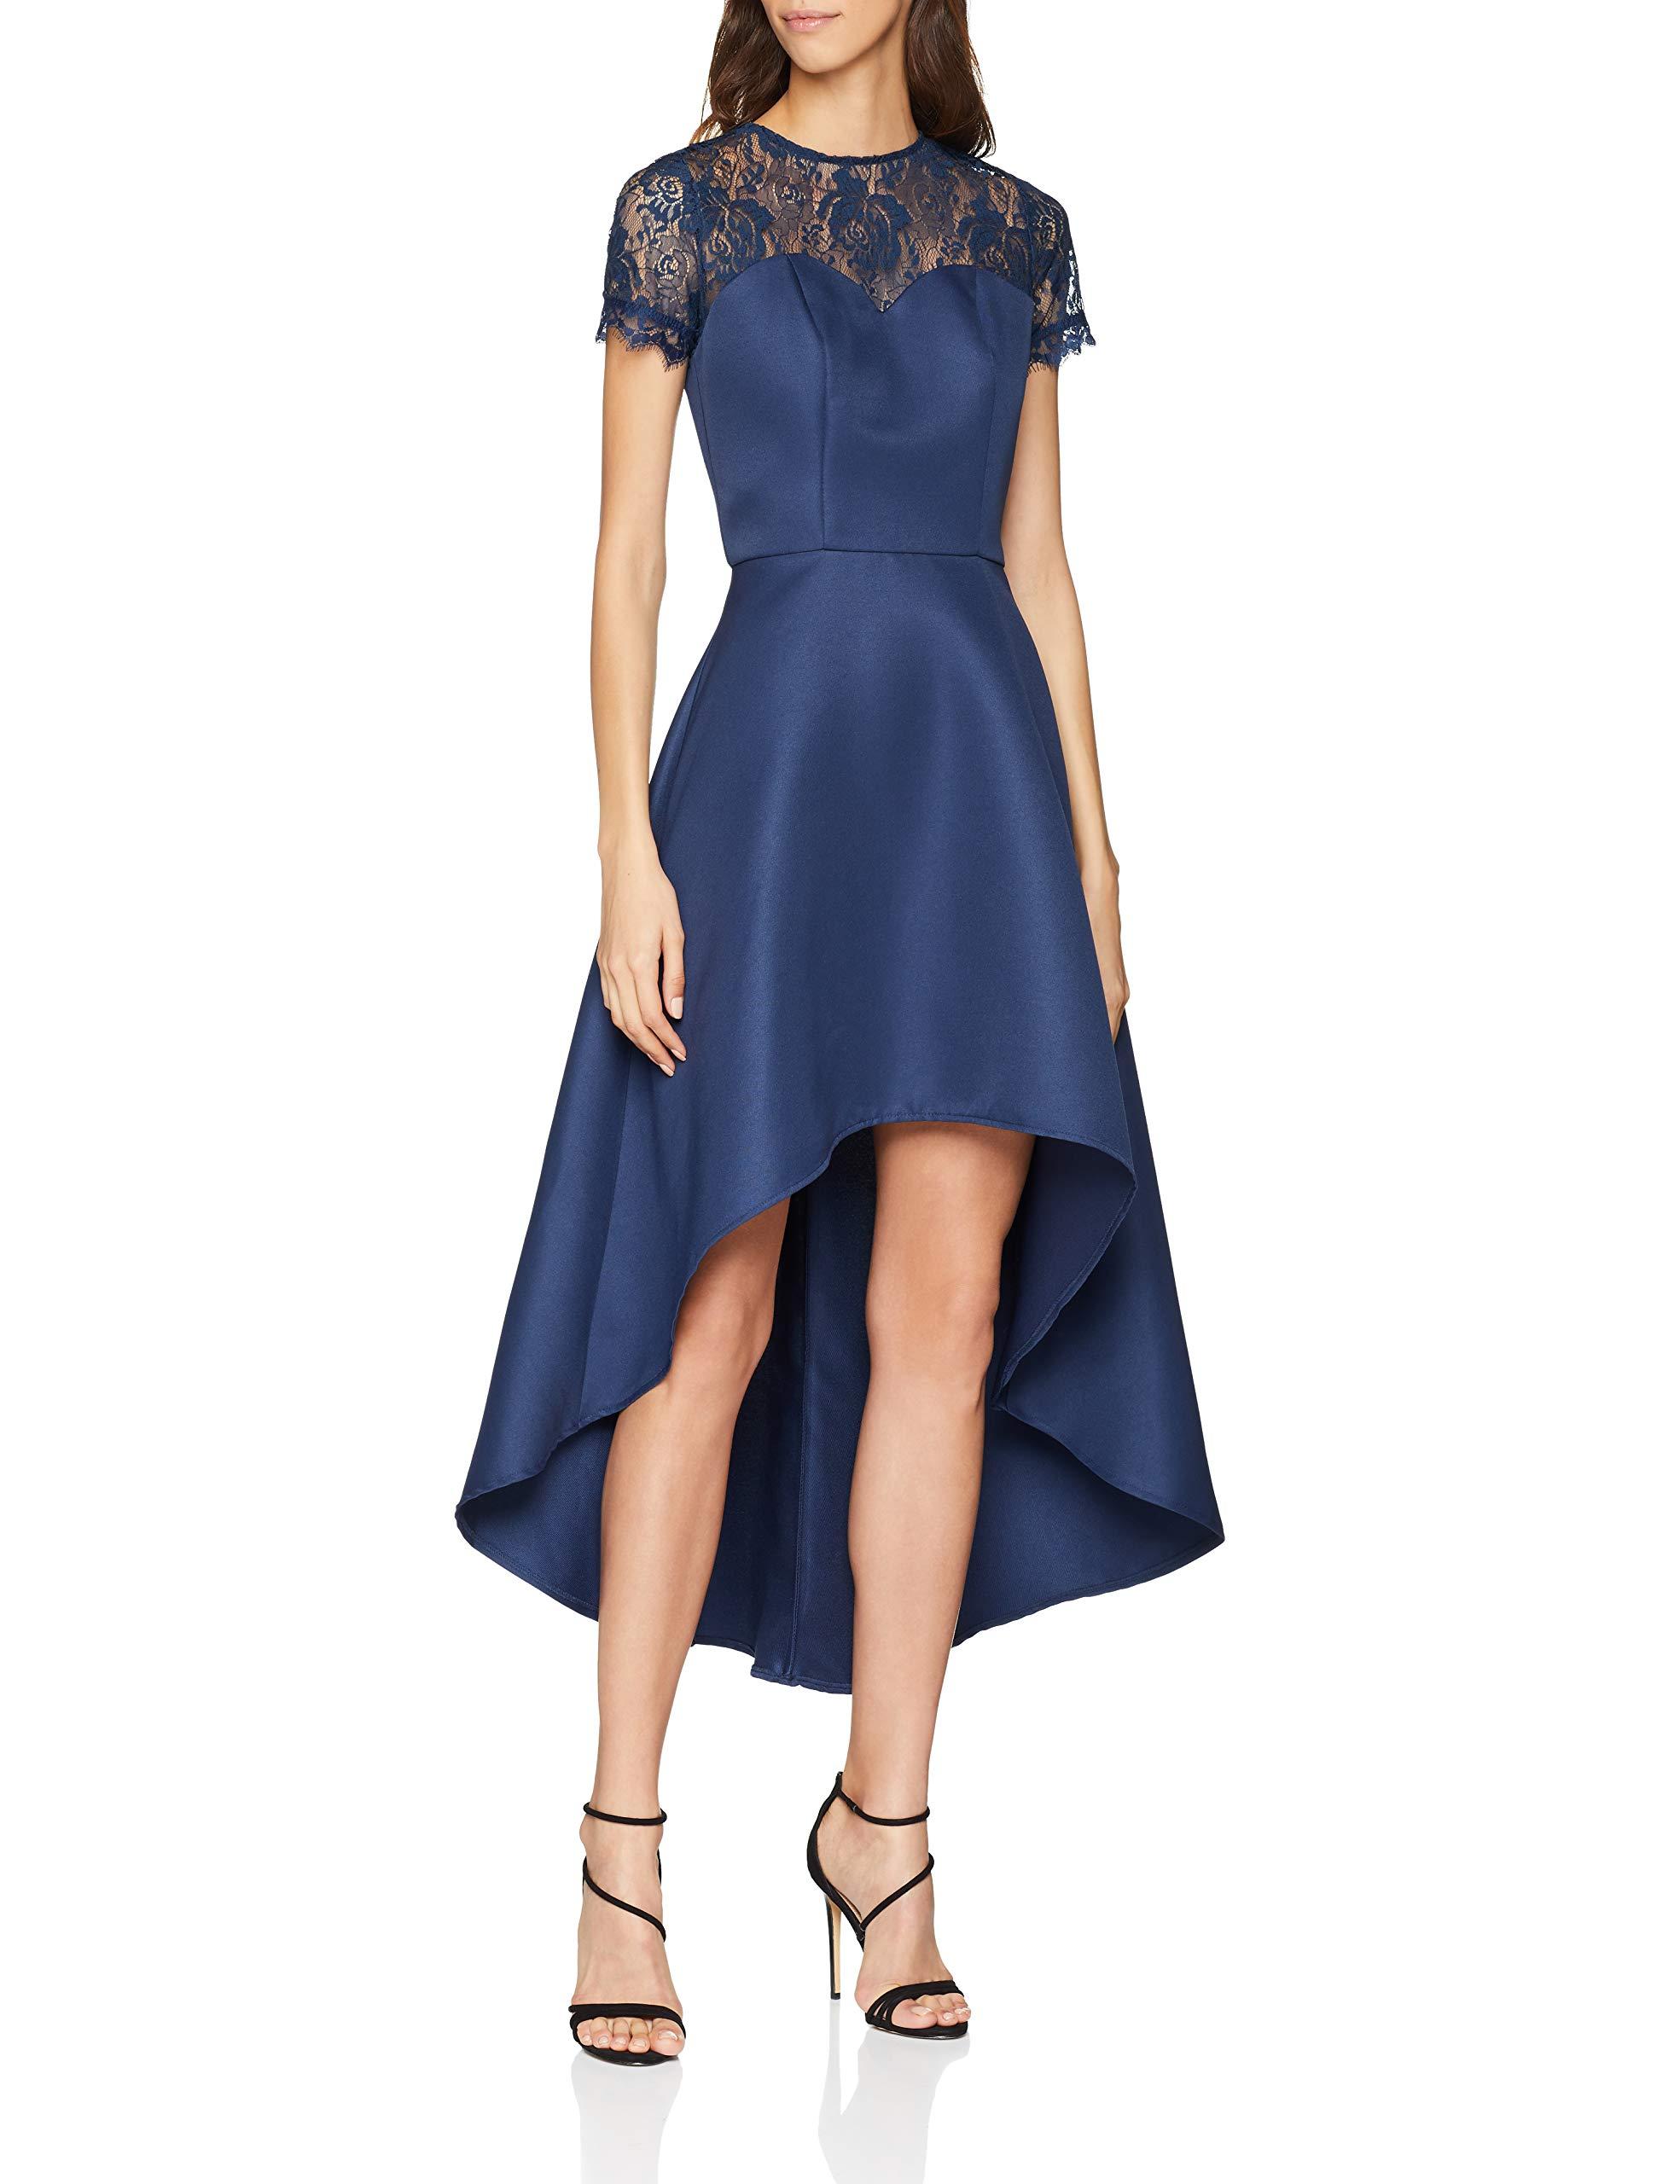 RobeBleu Chi Navy42taille FabricantUk London Dress 14Femme Jasper Ibgvf7mYy6